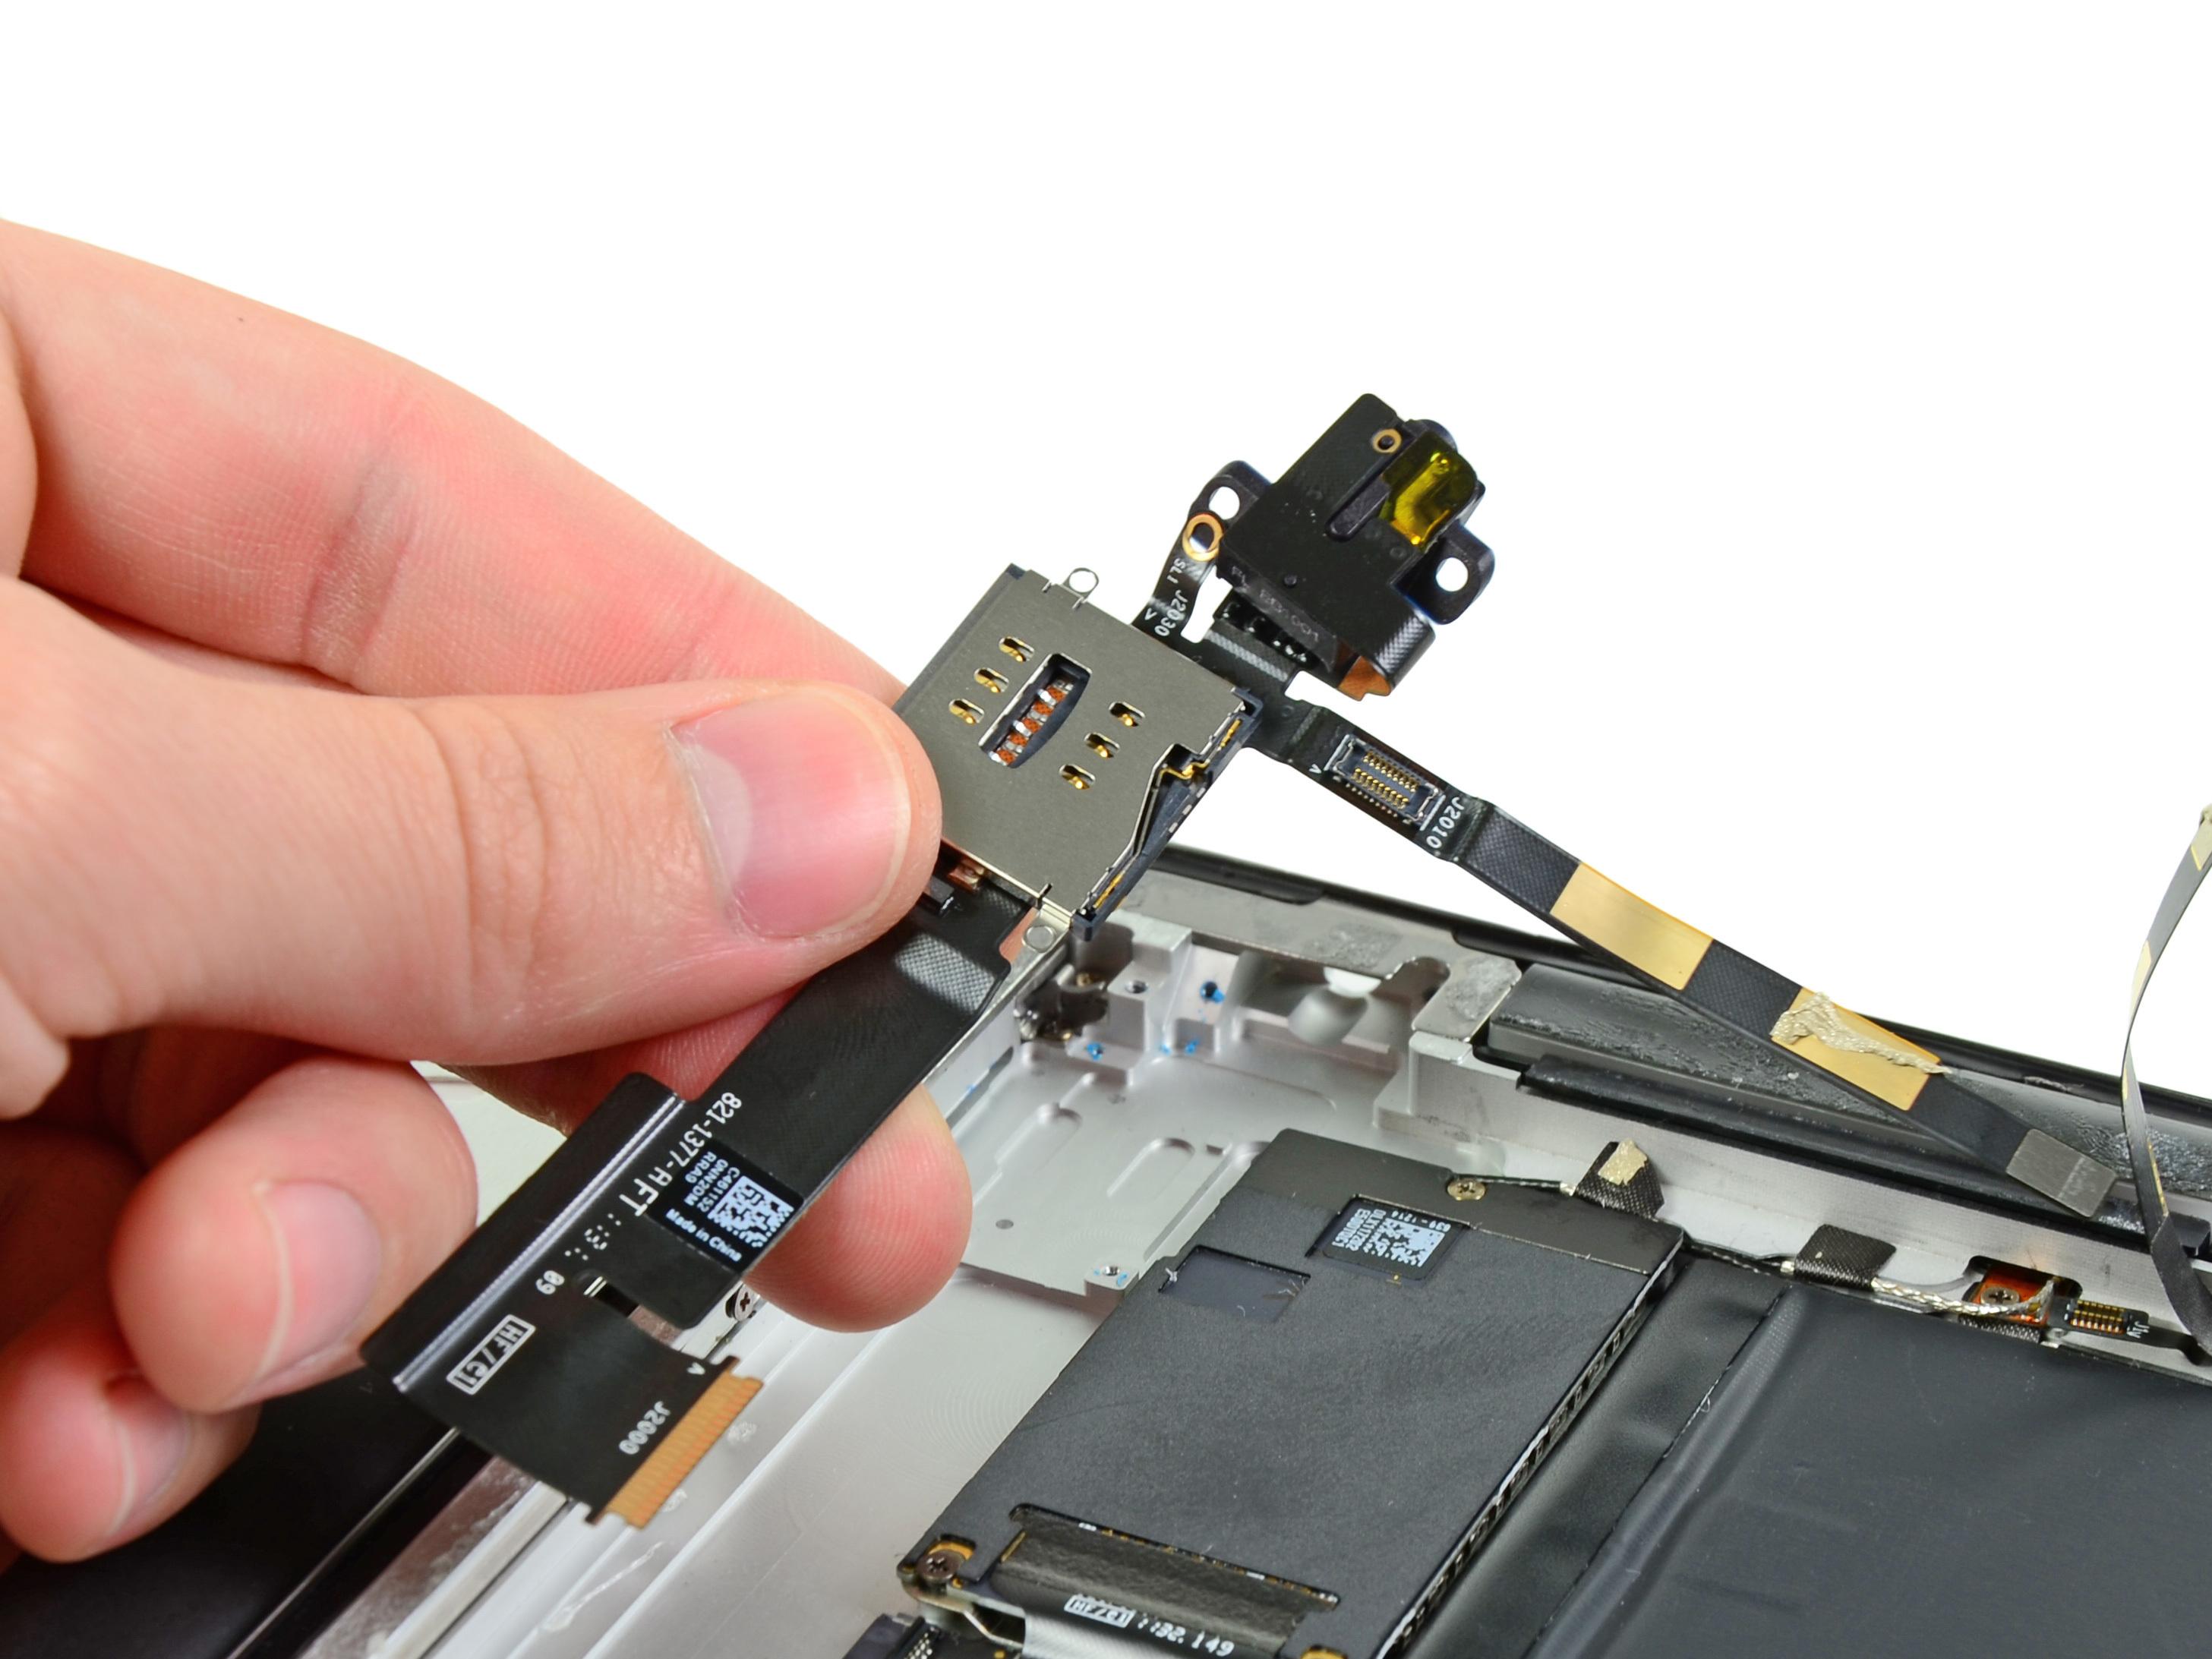 Ipad 2 Gsm Repair Ifixit Mini Touch Screen Digitizer Ic Chip Control Circuit Logic Board Headphone Jack Sim Slot